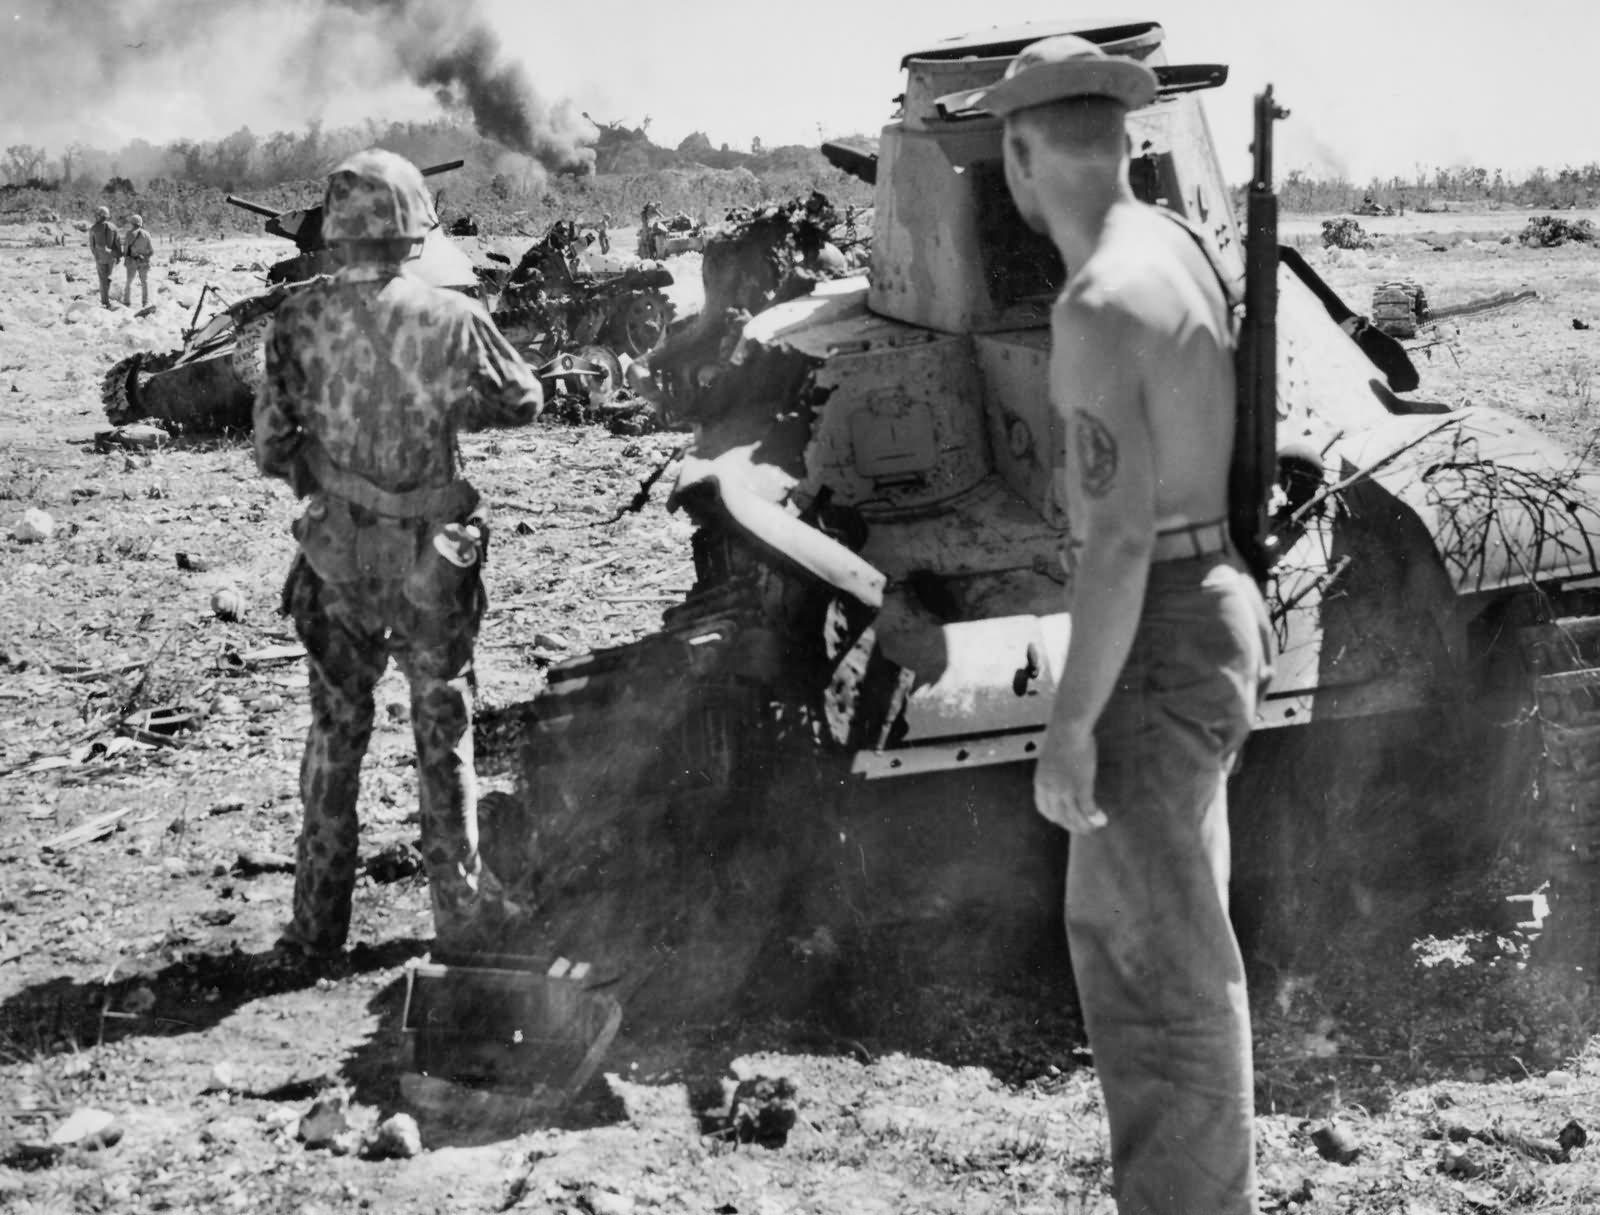 Japanese 14th Infantry Division Type 95 Ha Go Light Tanks Peleliu airfield 1944